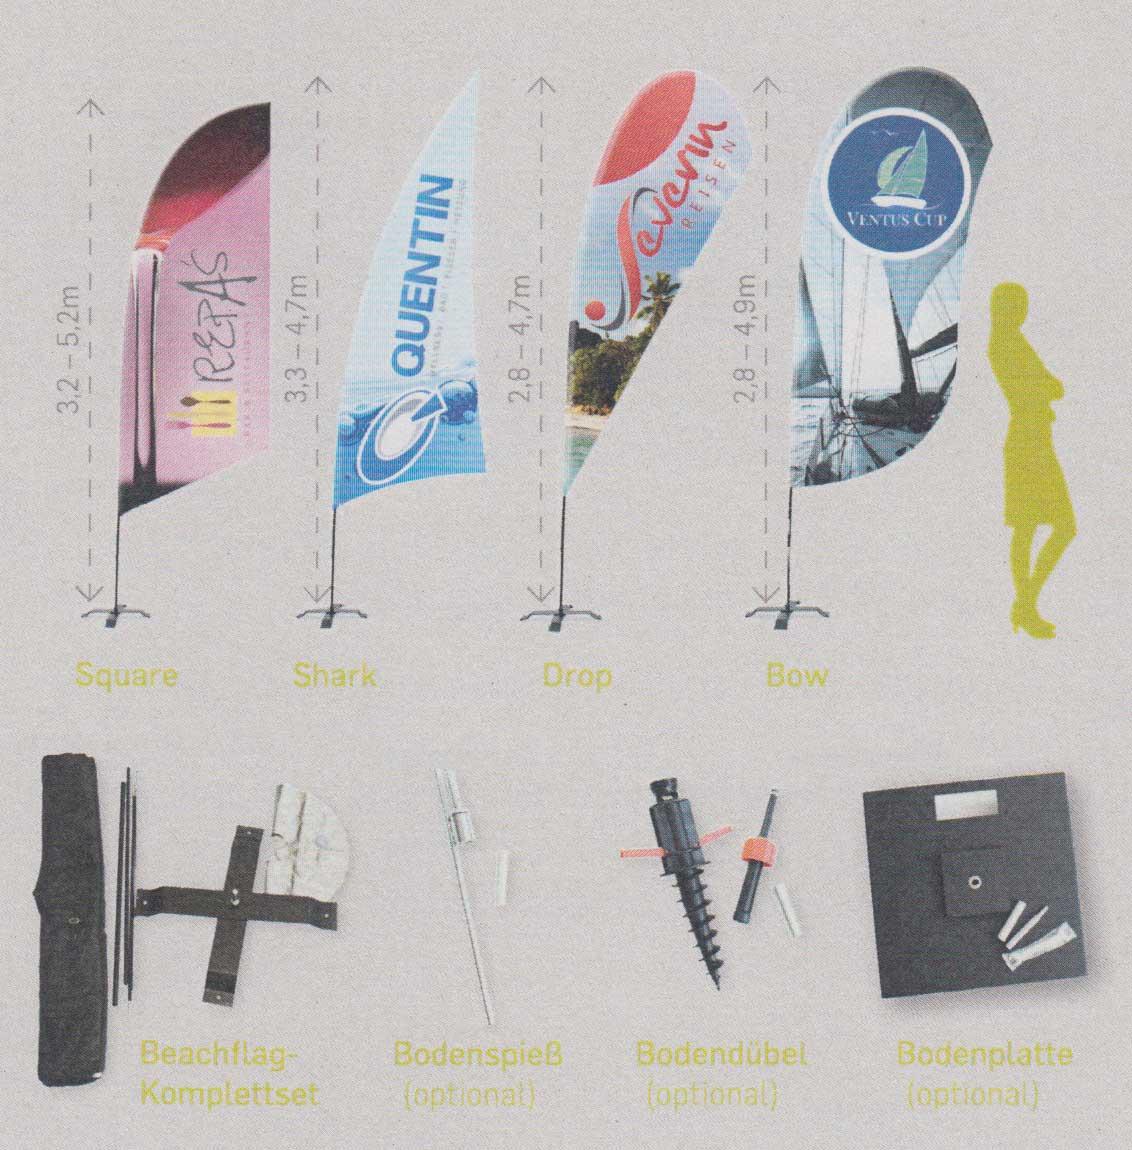 Beispiele Beachflags